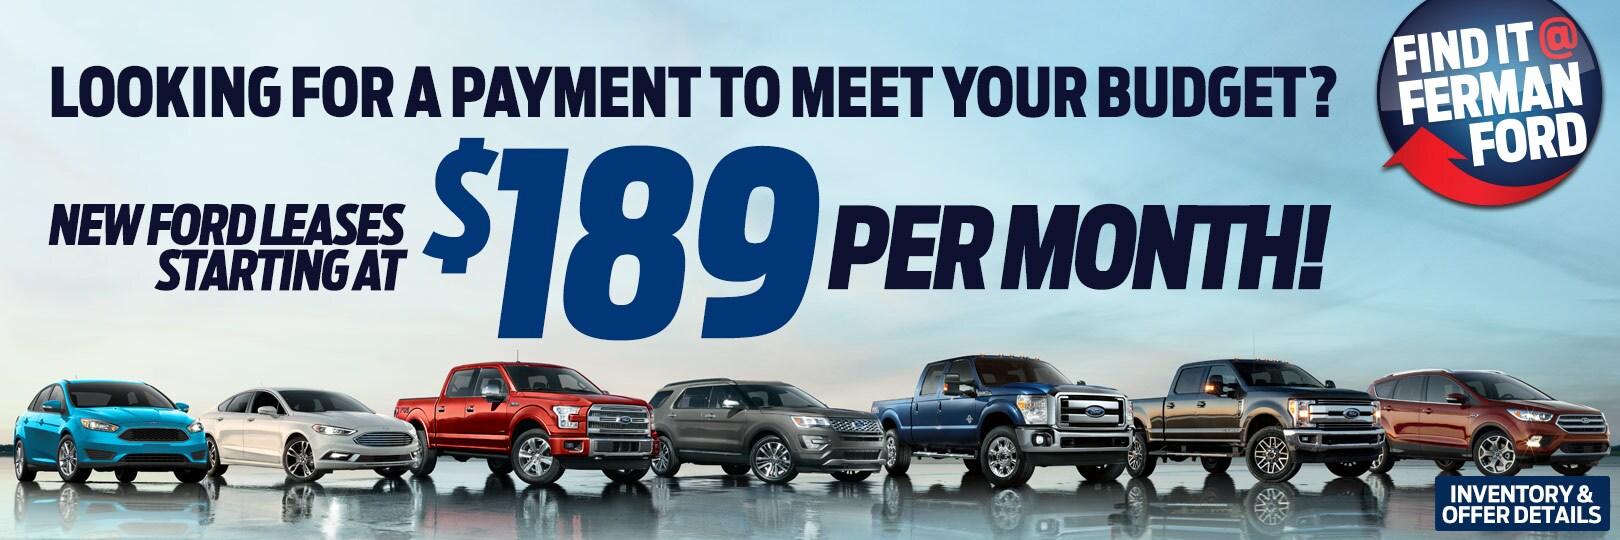 Karl Flammer Ford >> Ferman Ford   Ford Dealership in Clearwater FL